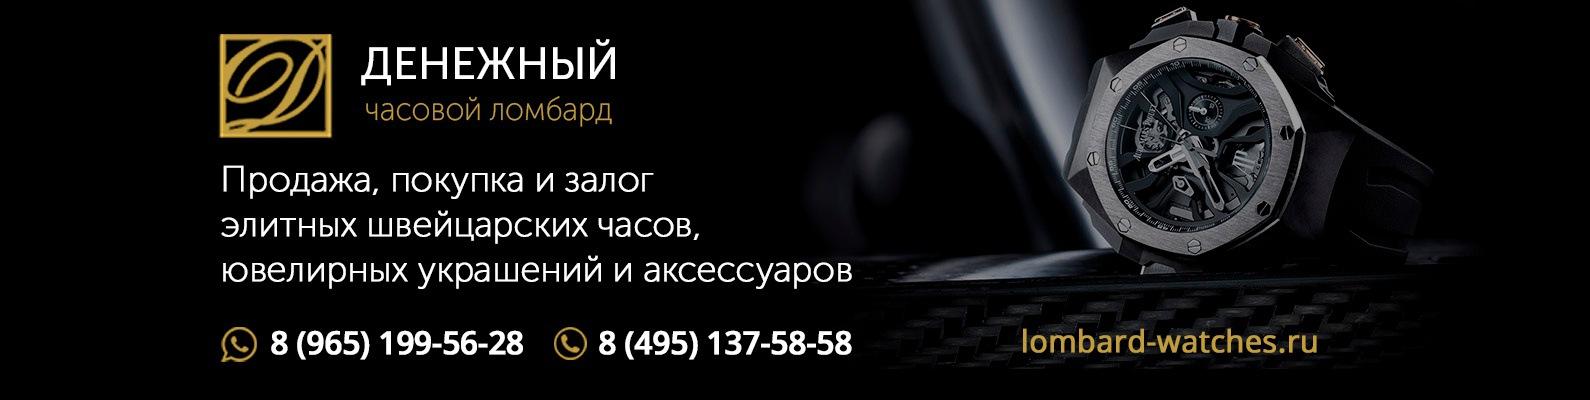 6b691203e44c Ломбард часов «ДЕНЕЖНЫЙ»   ВКонтакте